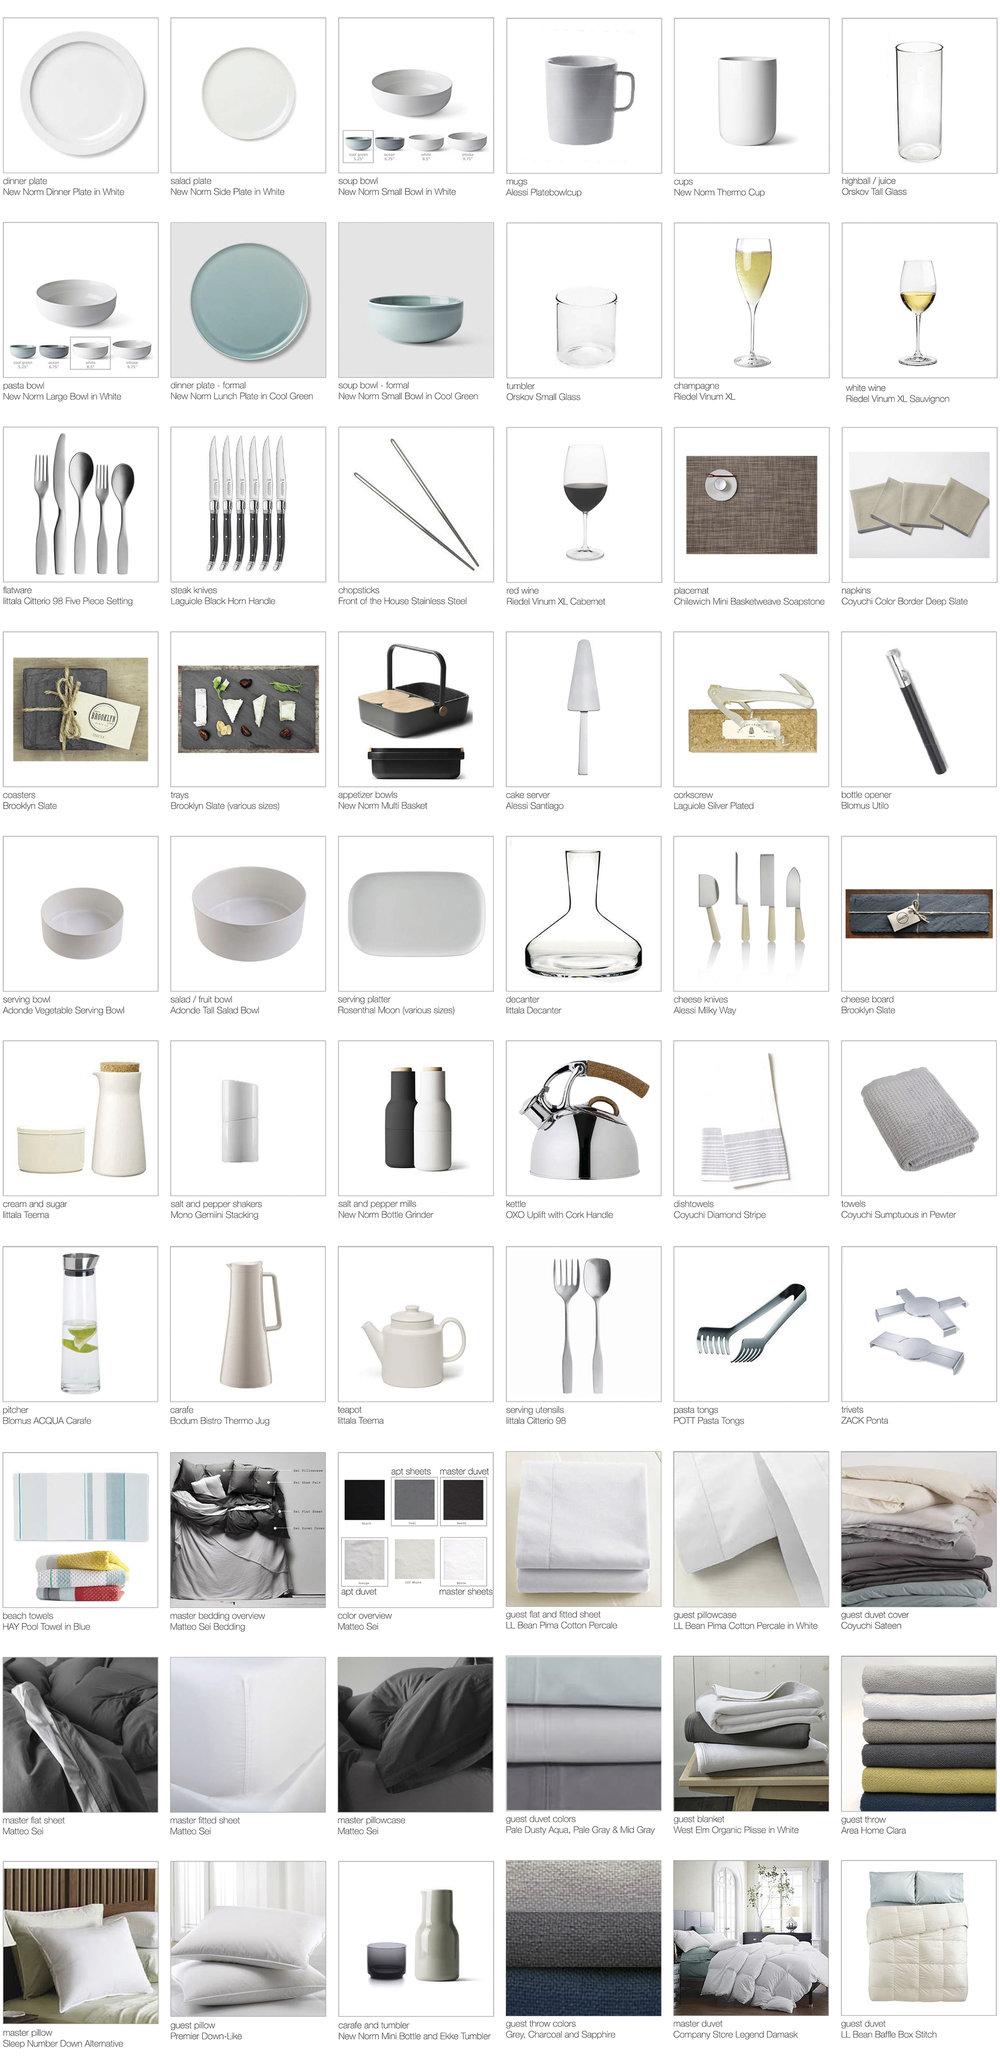 rc_housewares.jpg